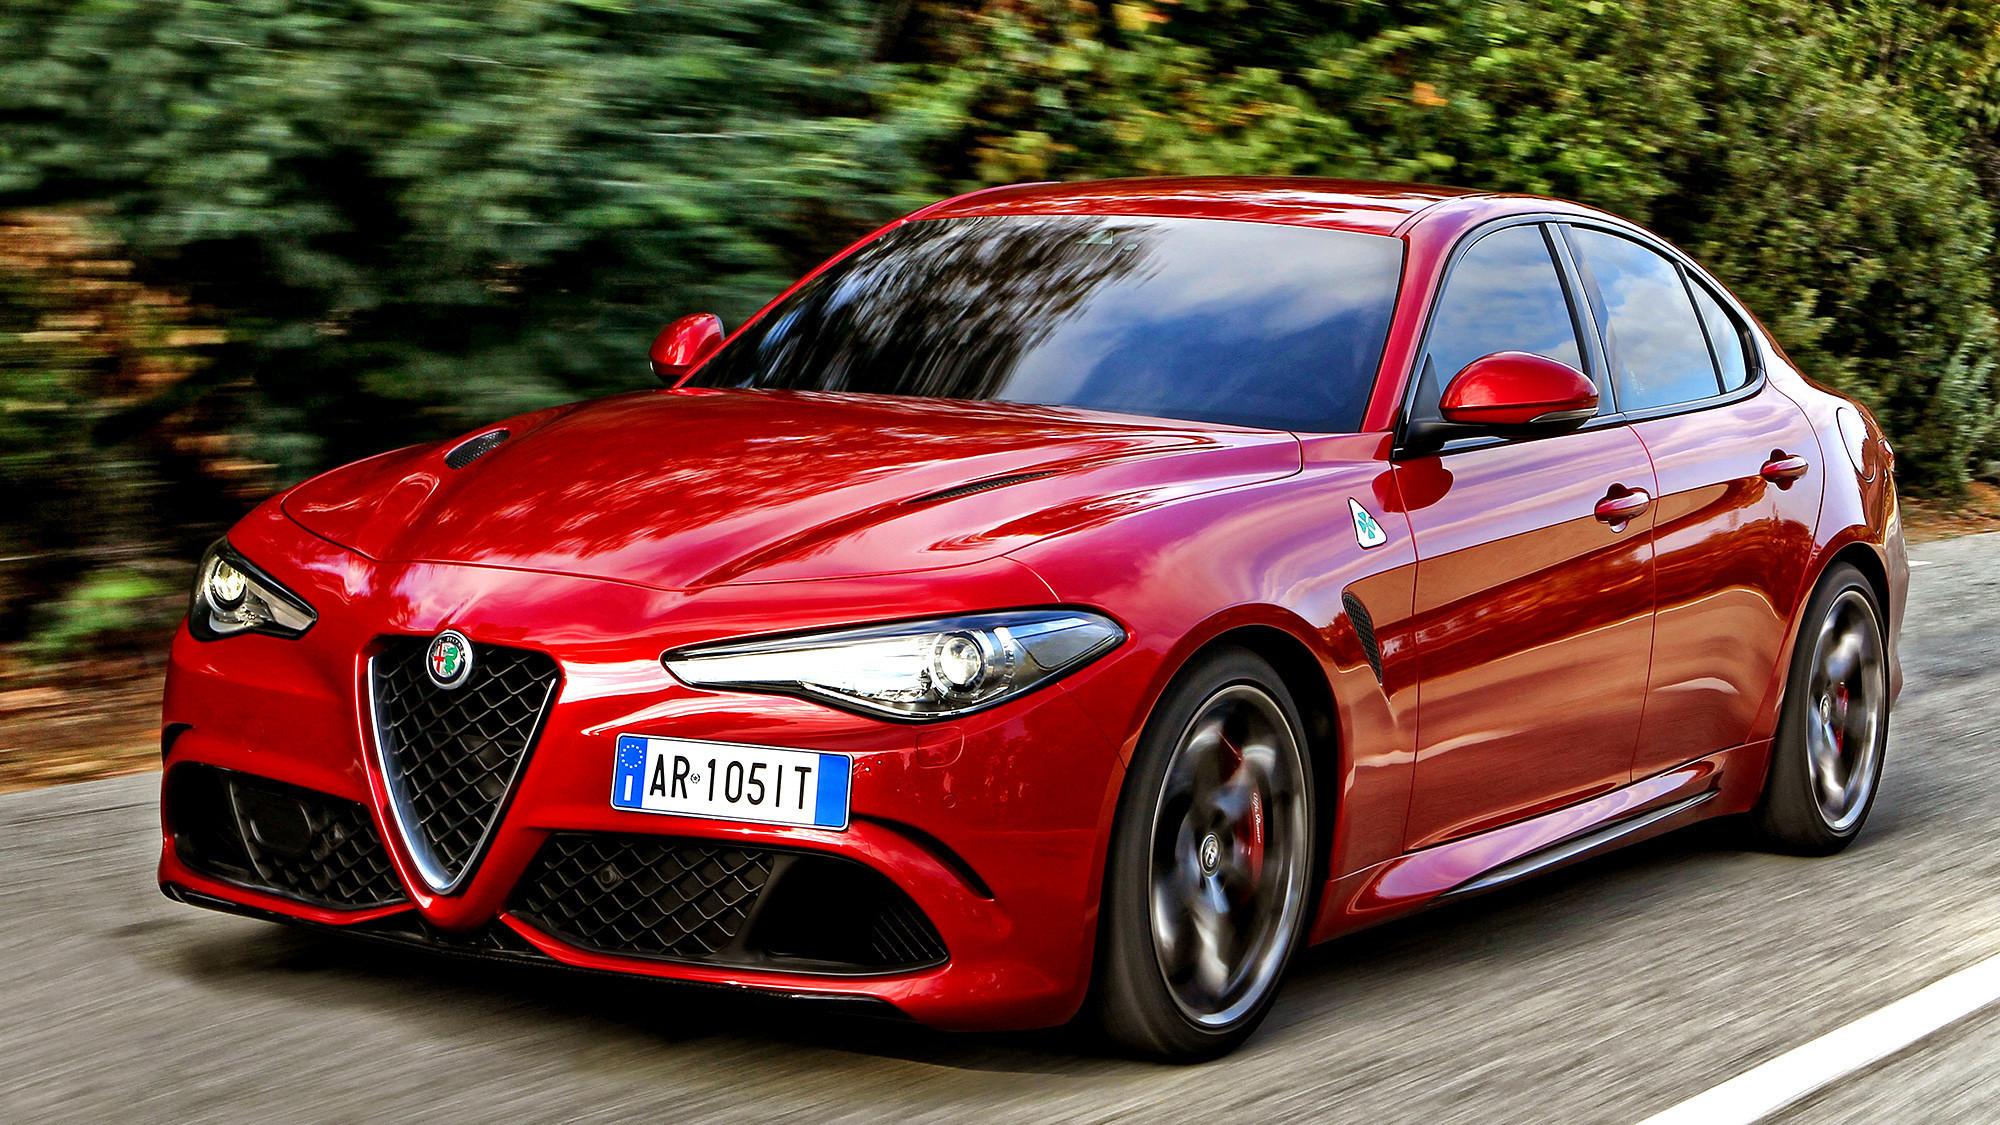 Alfa Romeos Giulia Quadrifoglio is a wolf in sheeps clothing